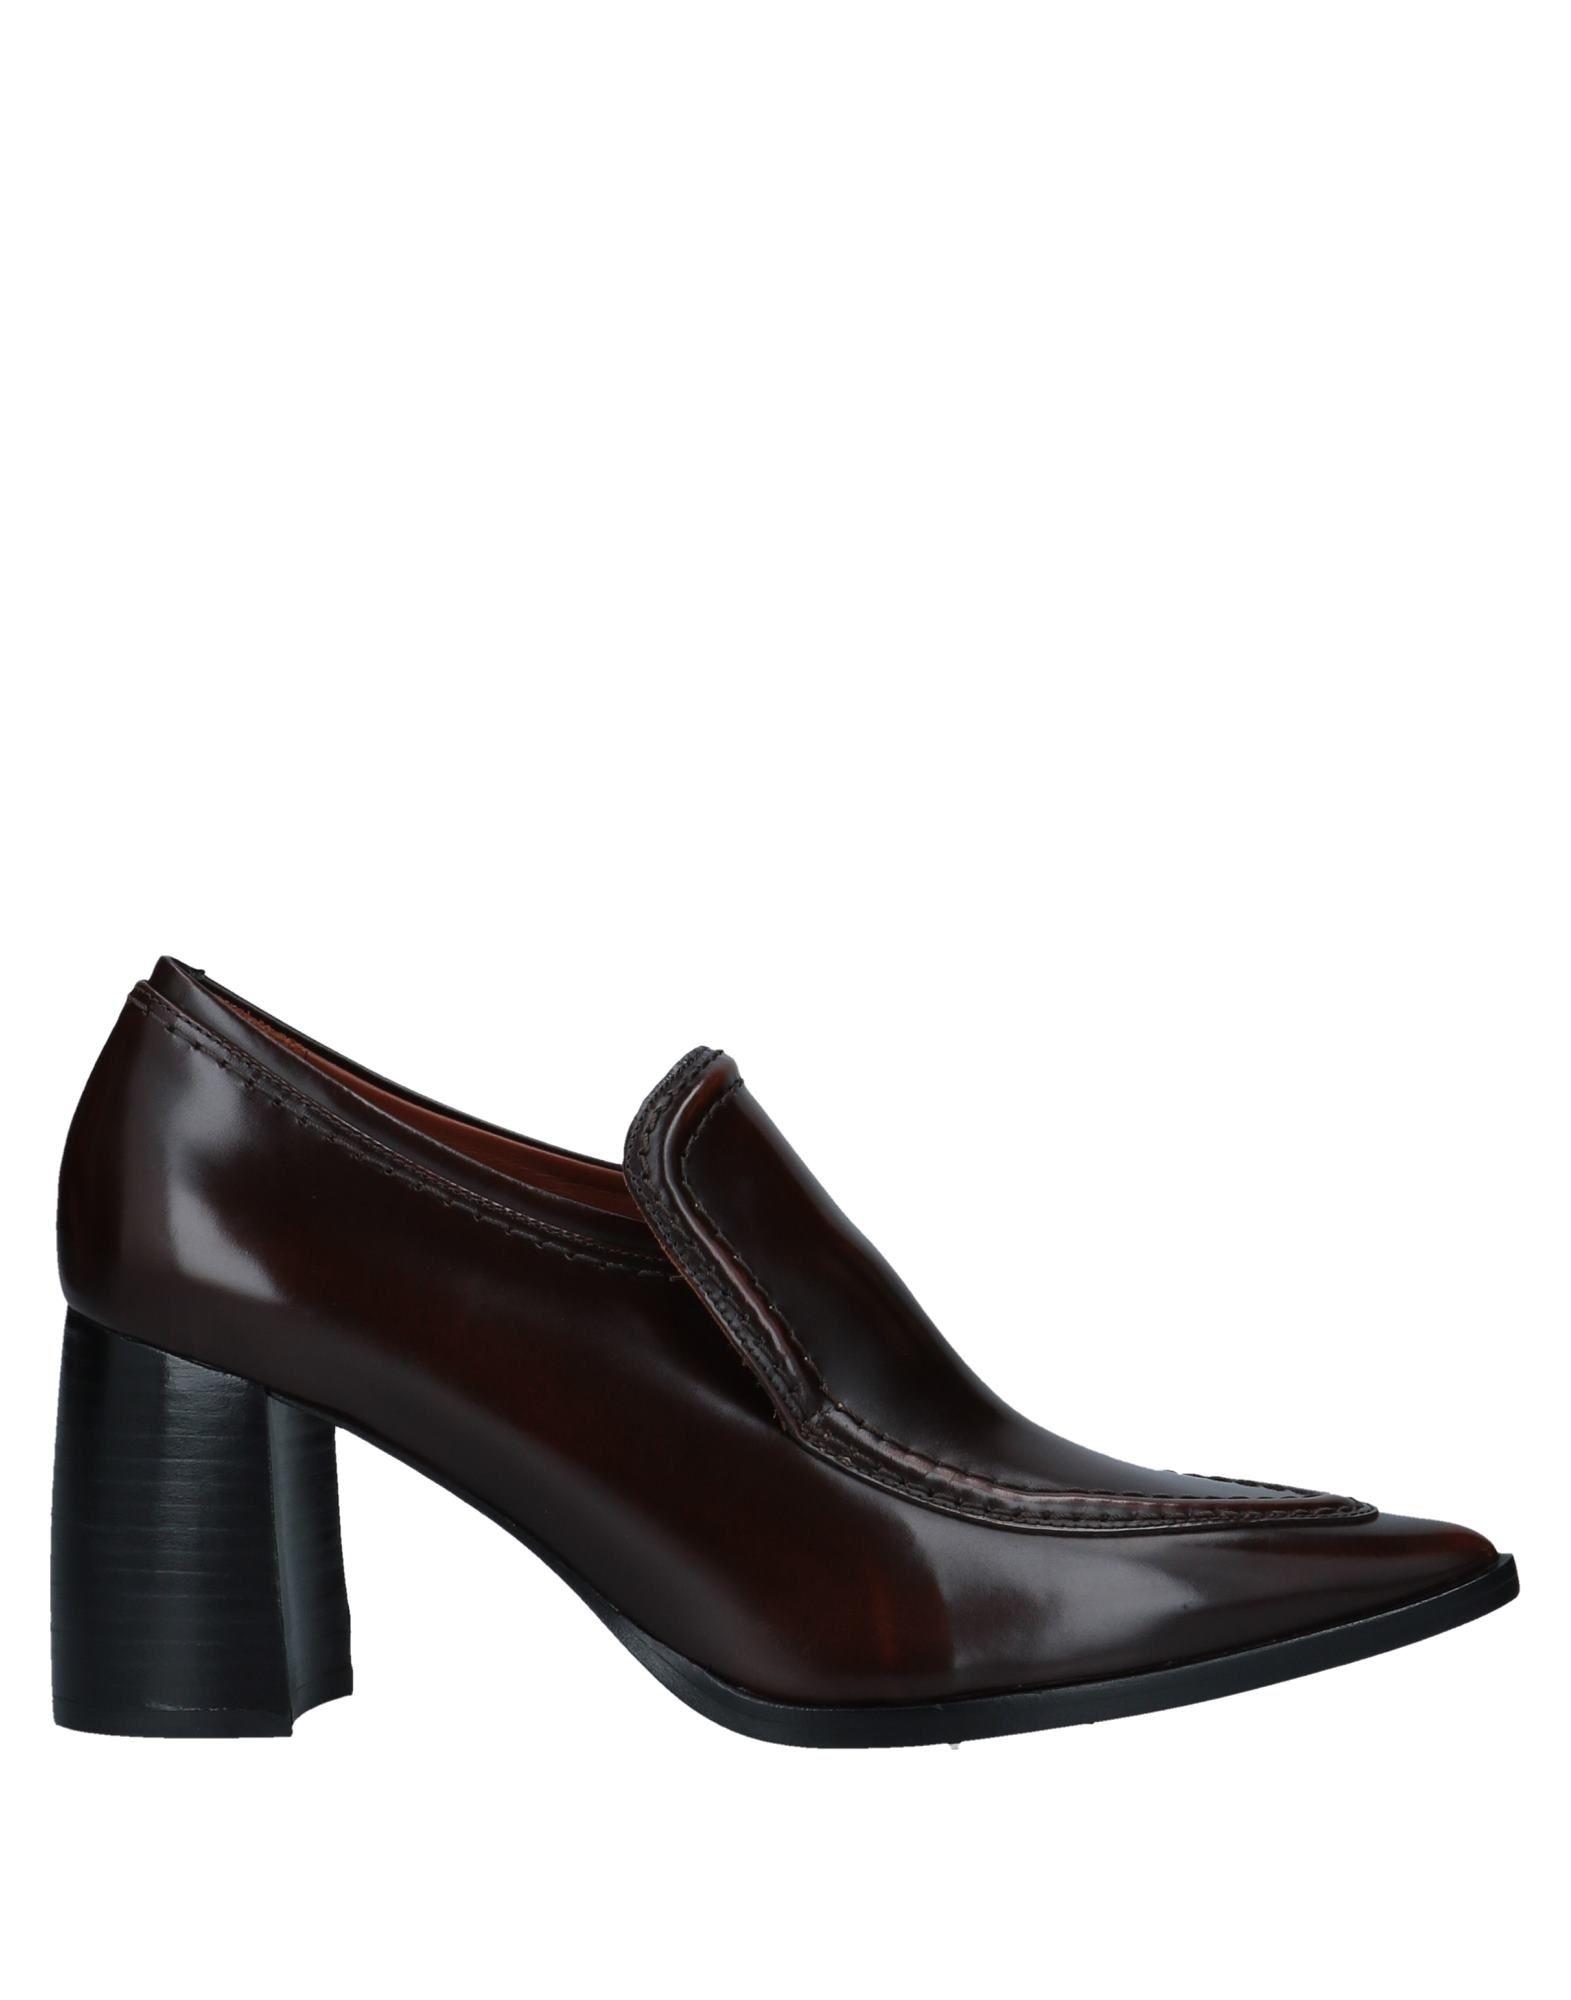 Joseph Mokassins Damen  11549196FGGut aussehende strapazierfähige Schuhe